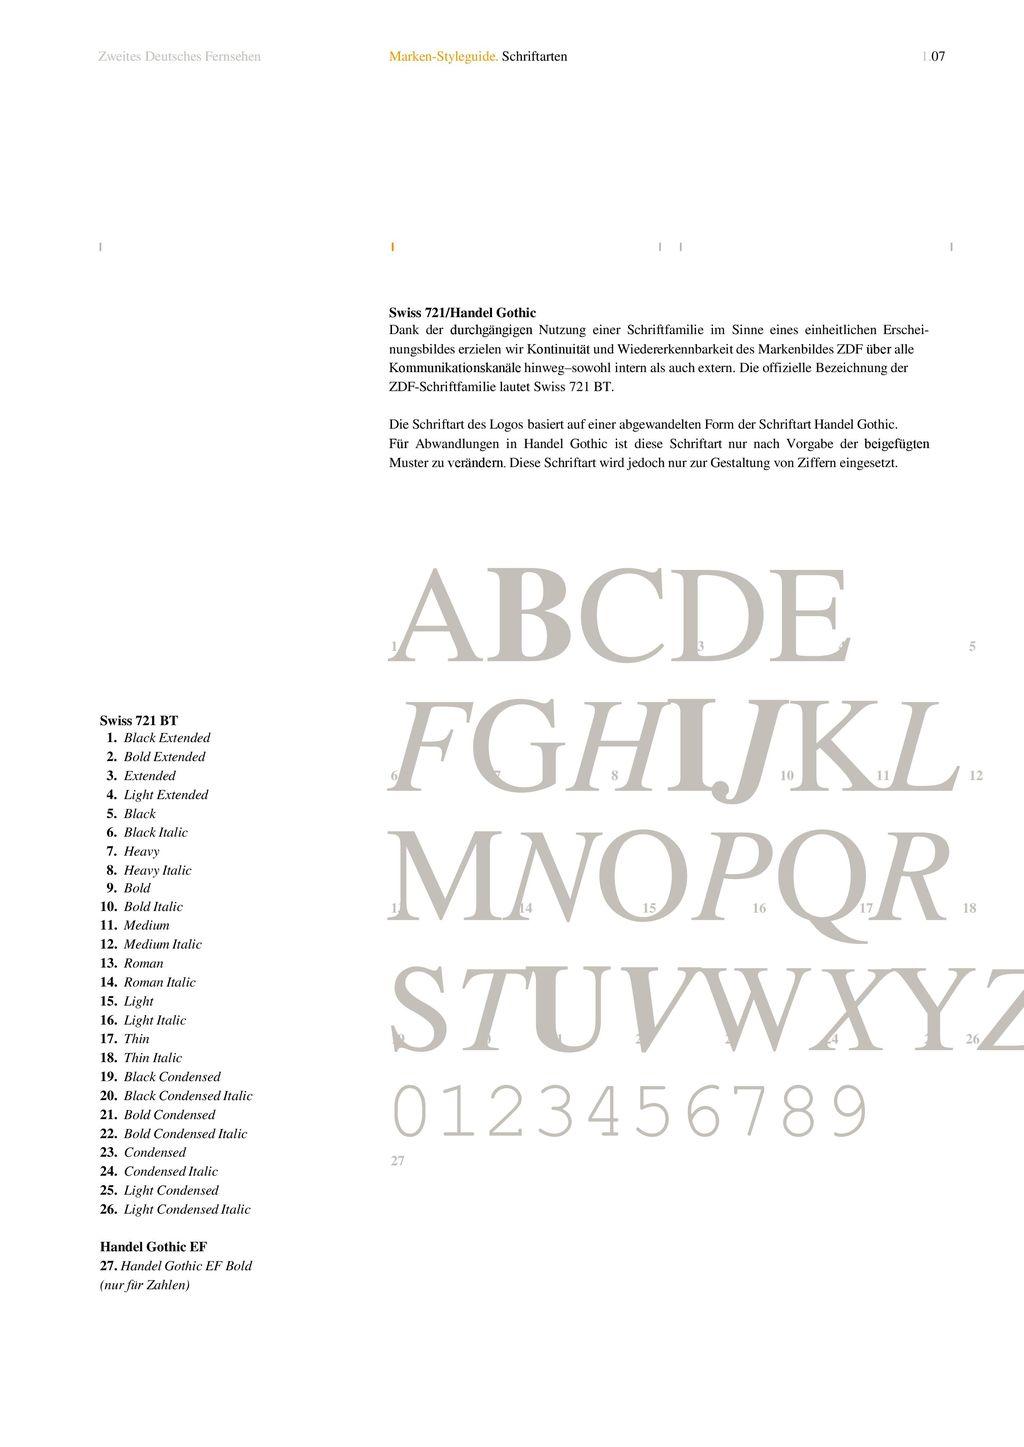 ABCDE FGHIJKL MNOPQR STUVWXYZ 0123456789 Swiss 721/Handel Gothic